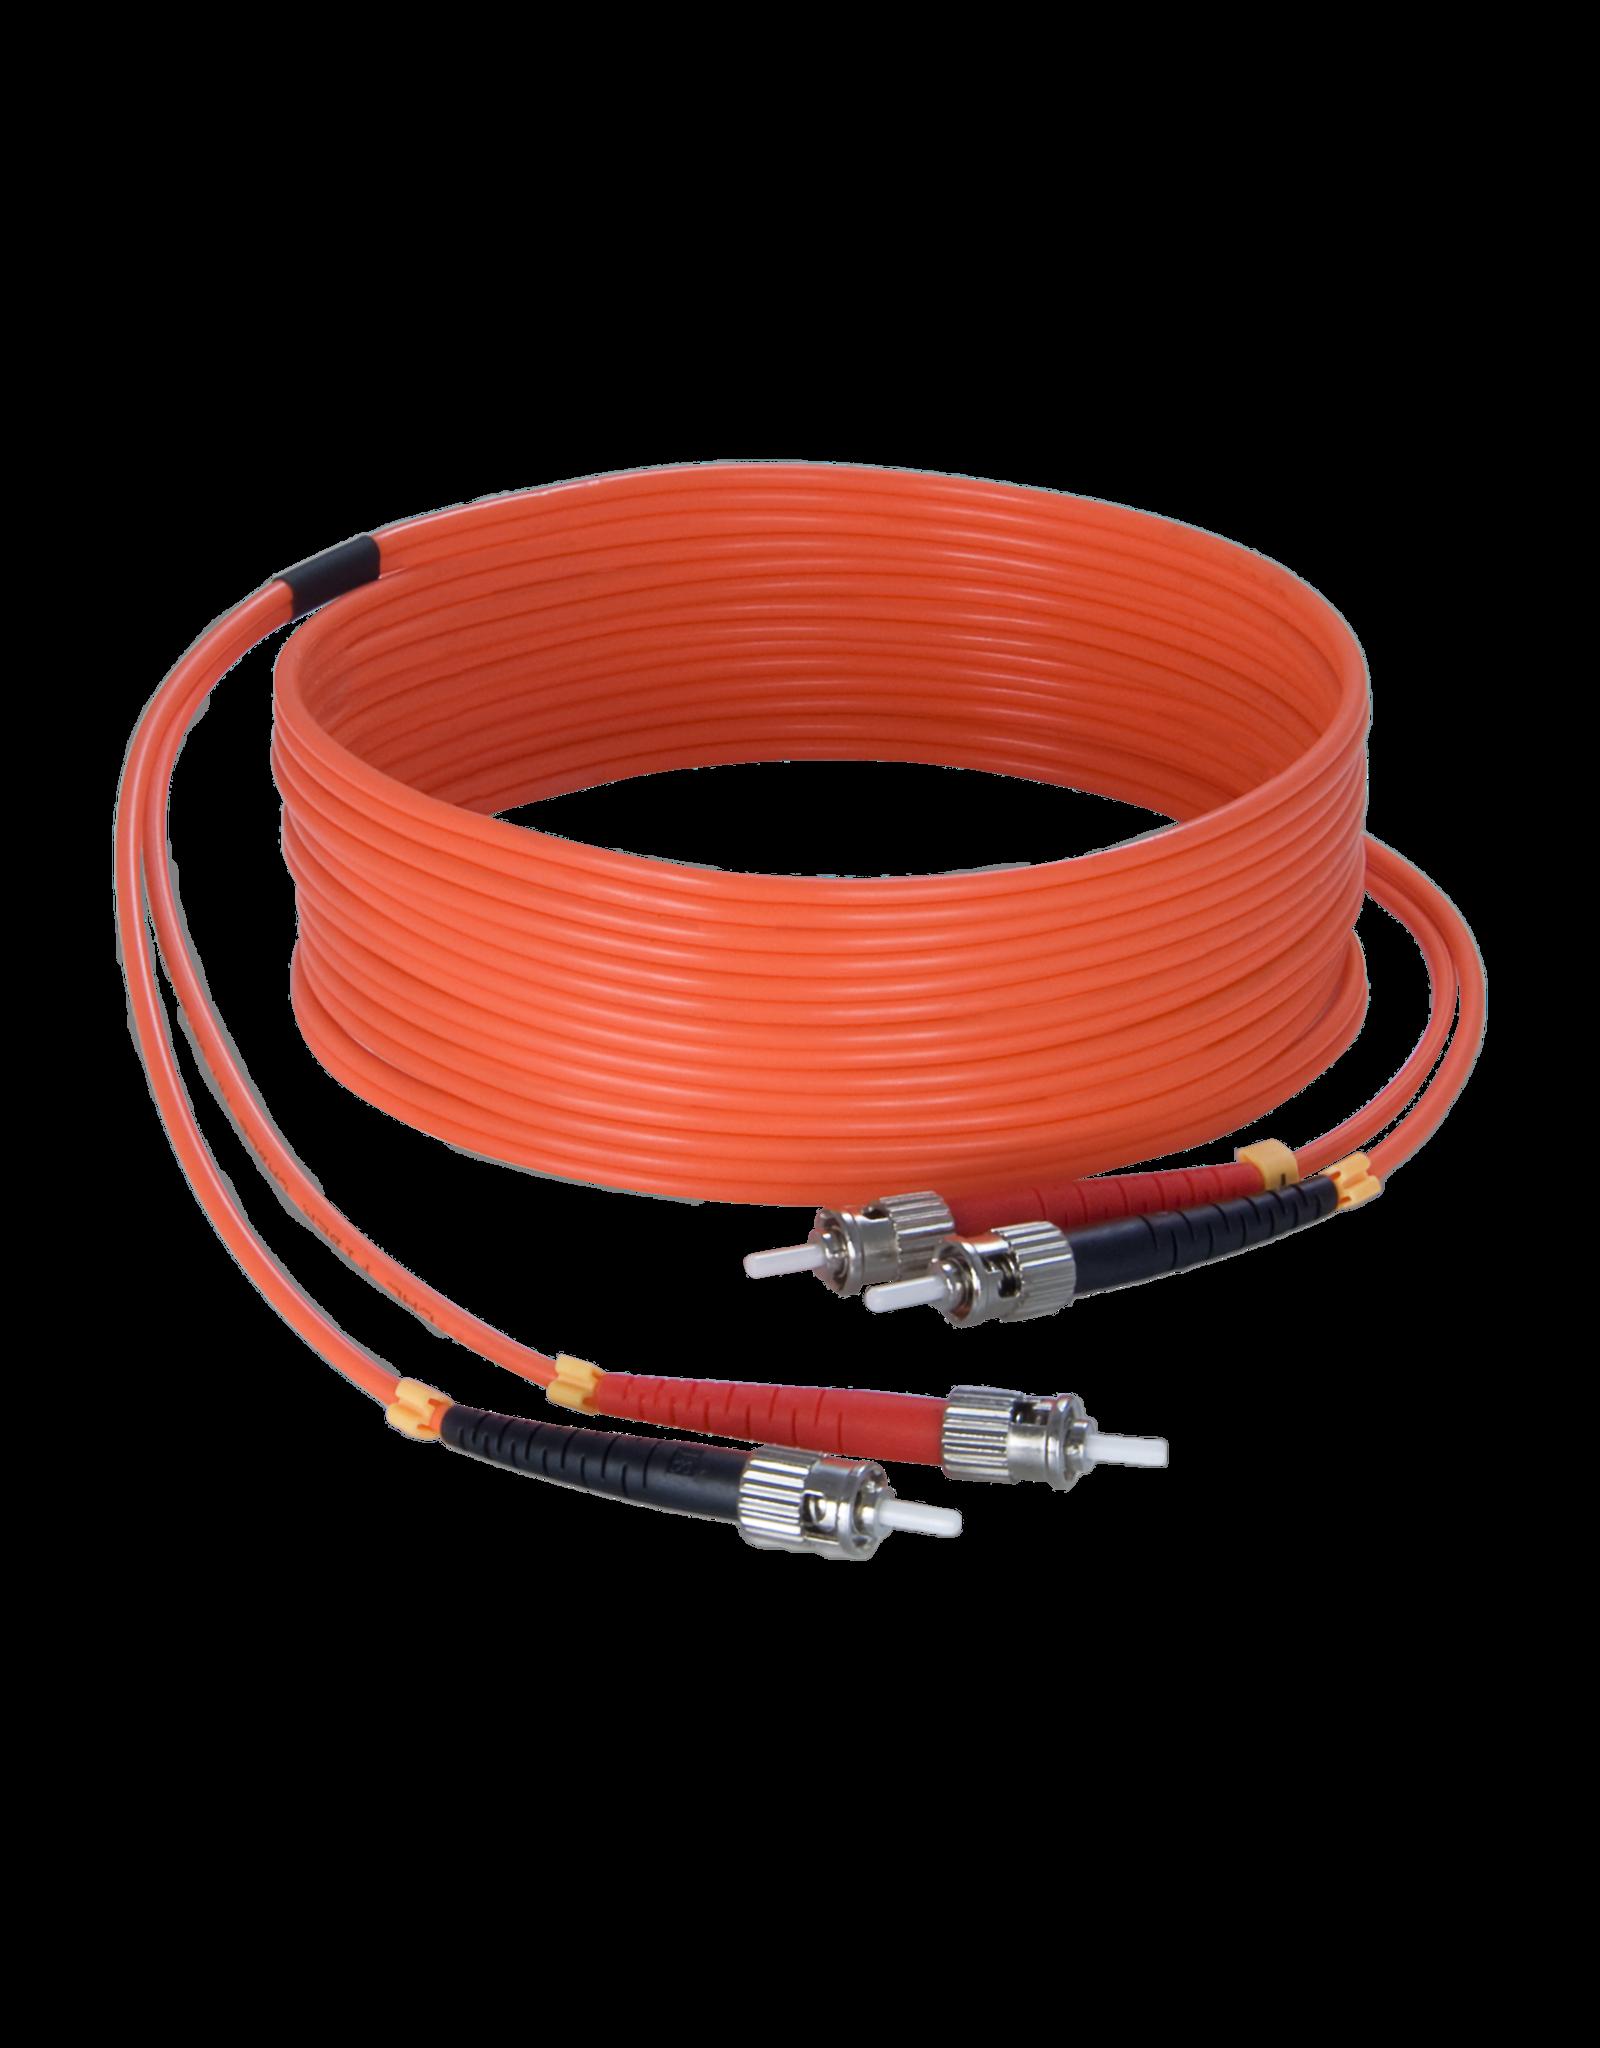 Audac Fiber optic cable - st/pc - st/pc - LSHF 1 meter